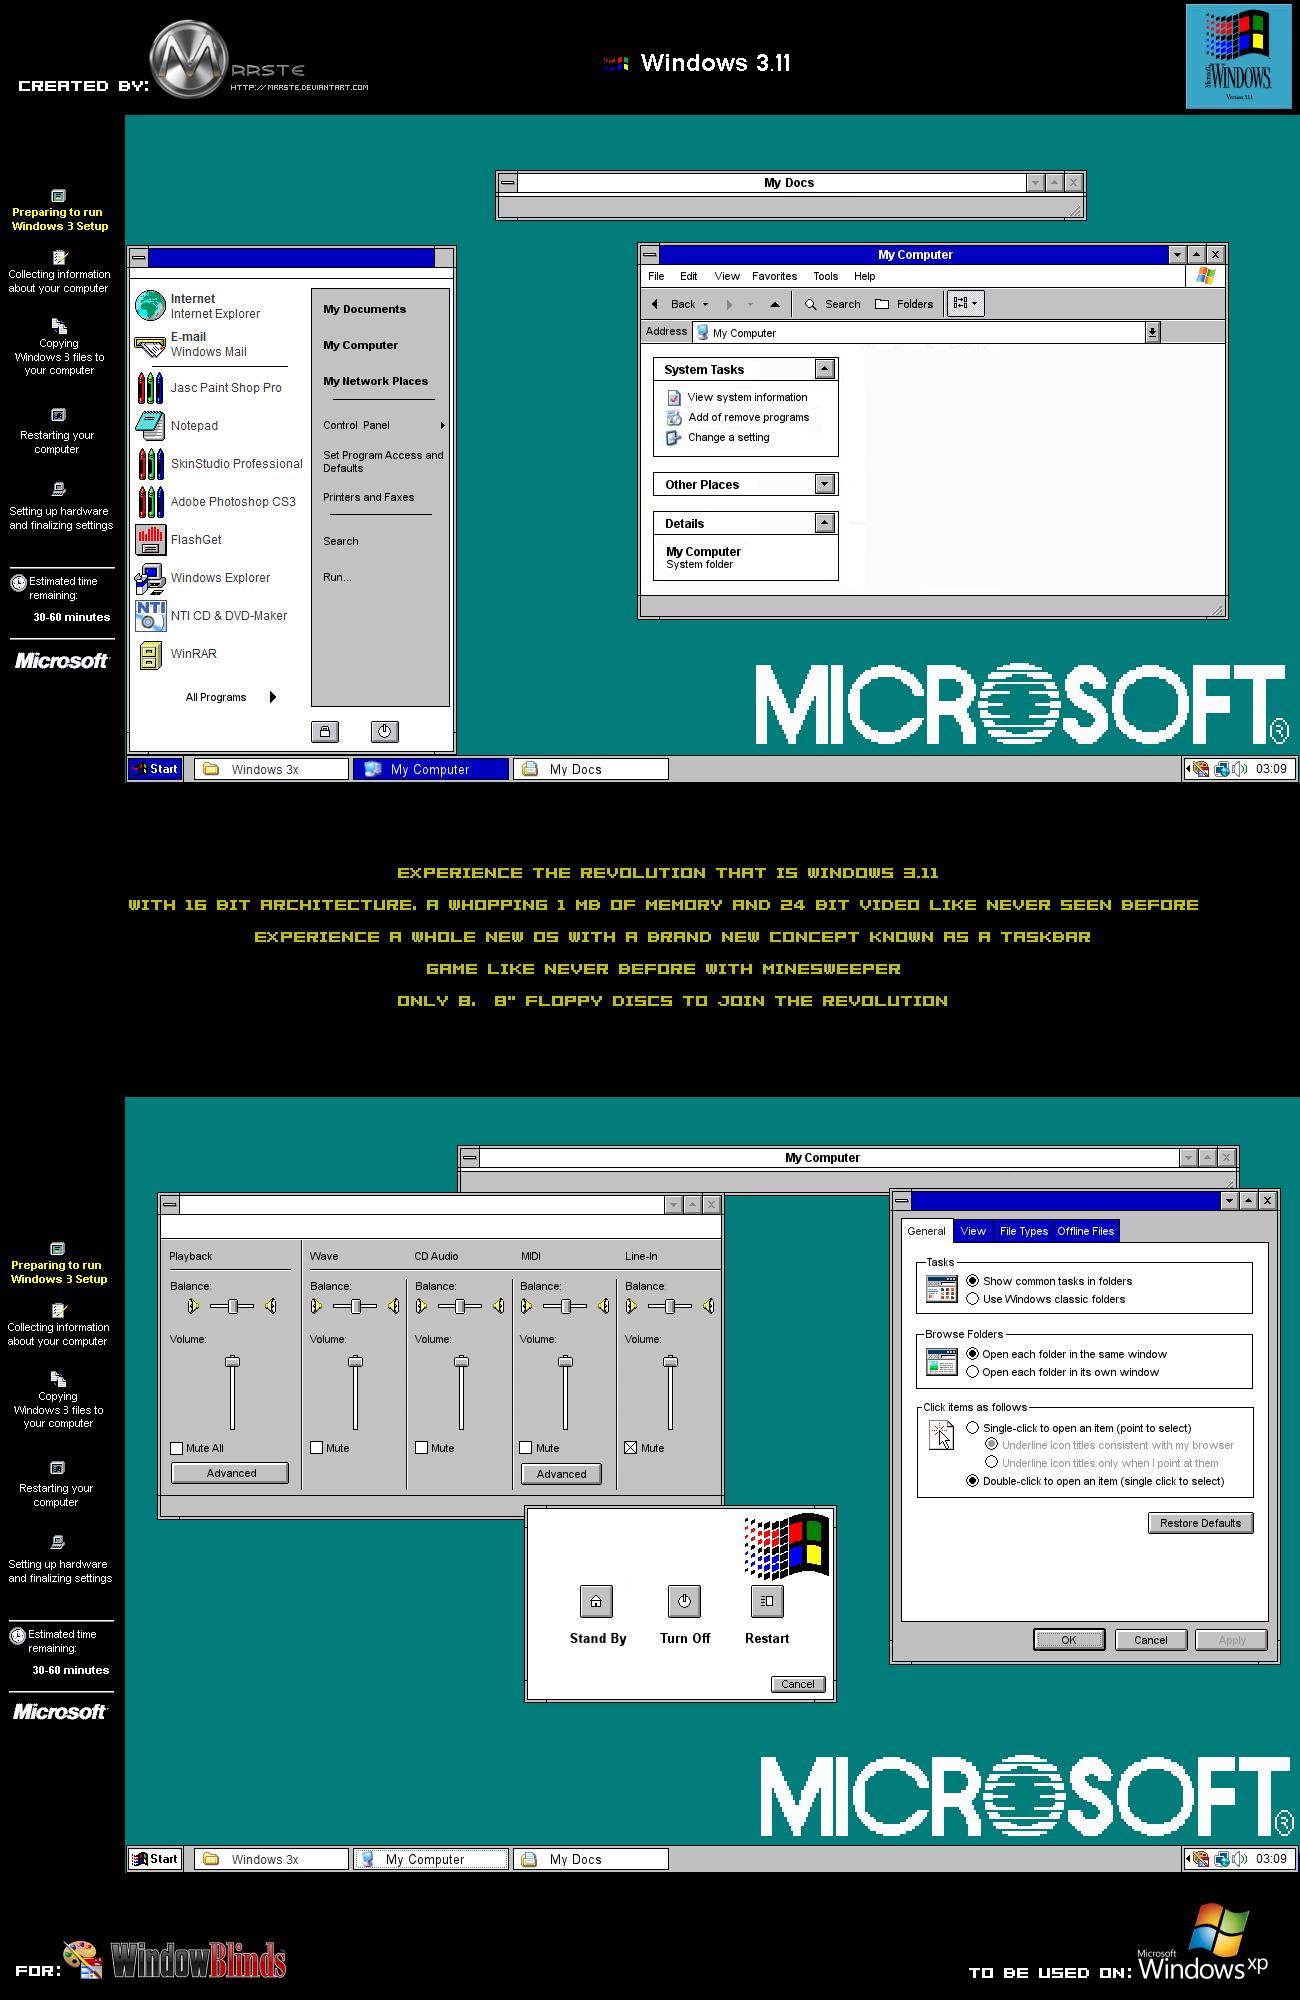 Windows 3.11 XP by mrrste